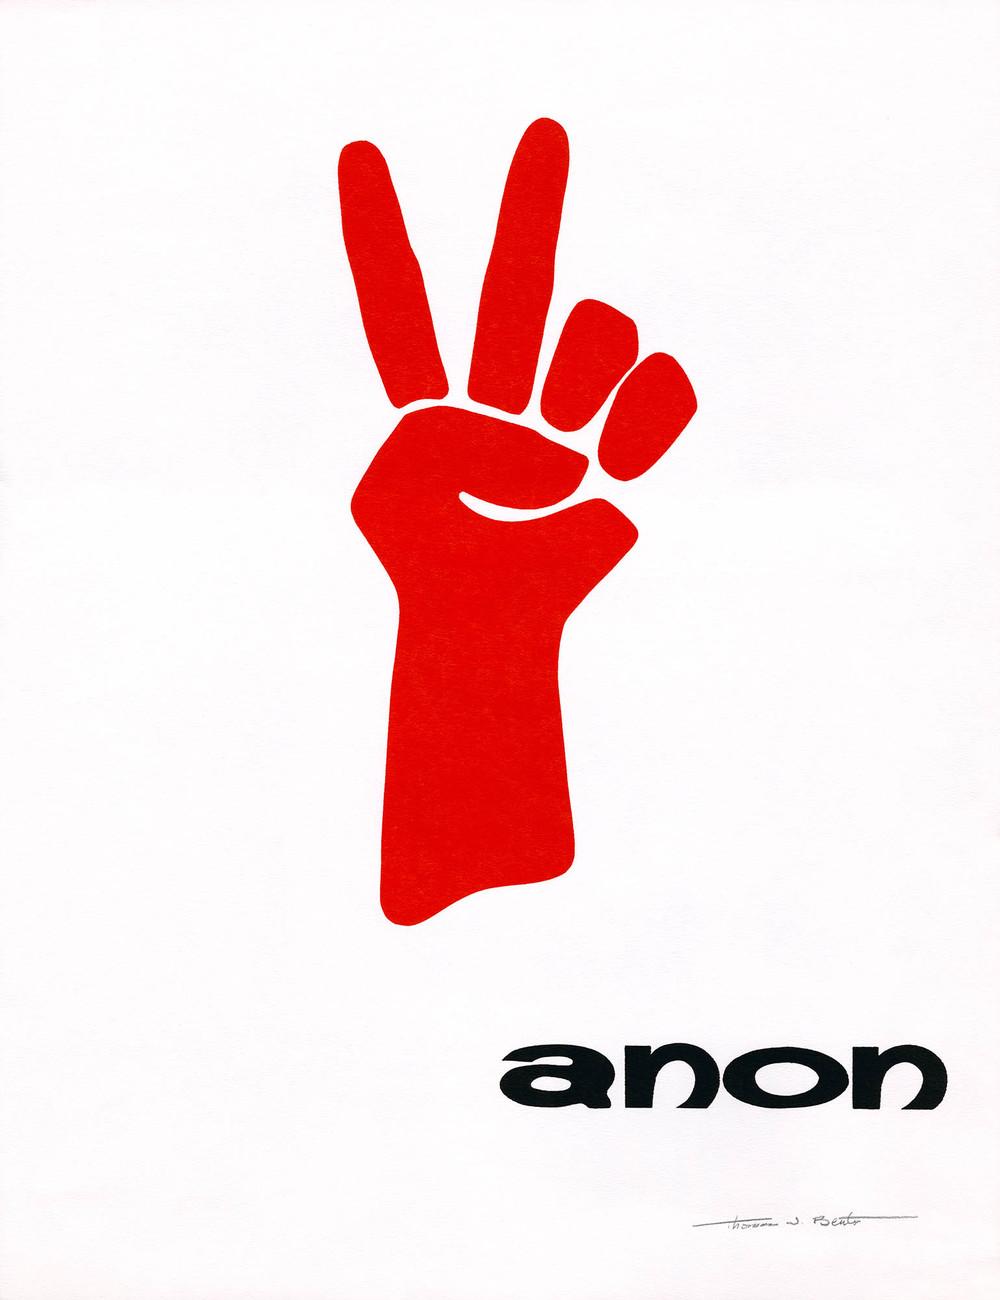 Benton - Anon.jpg